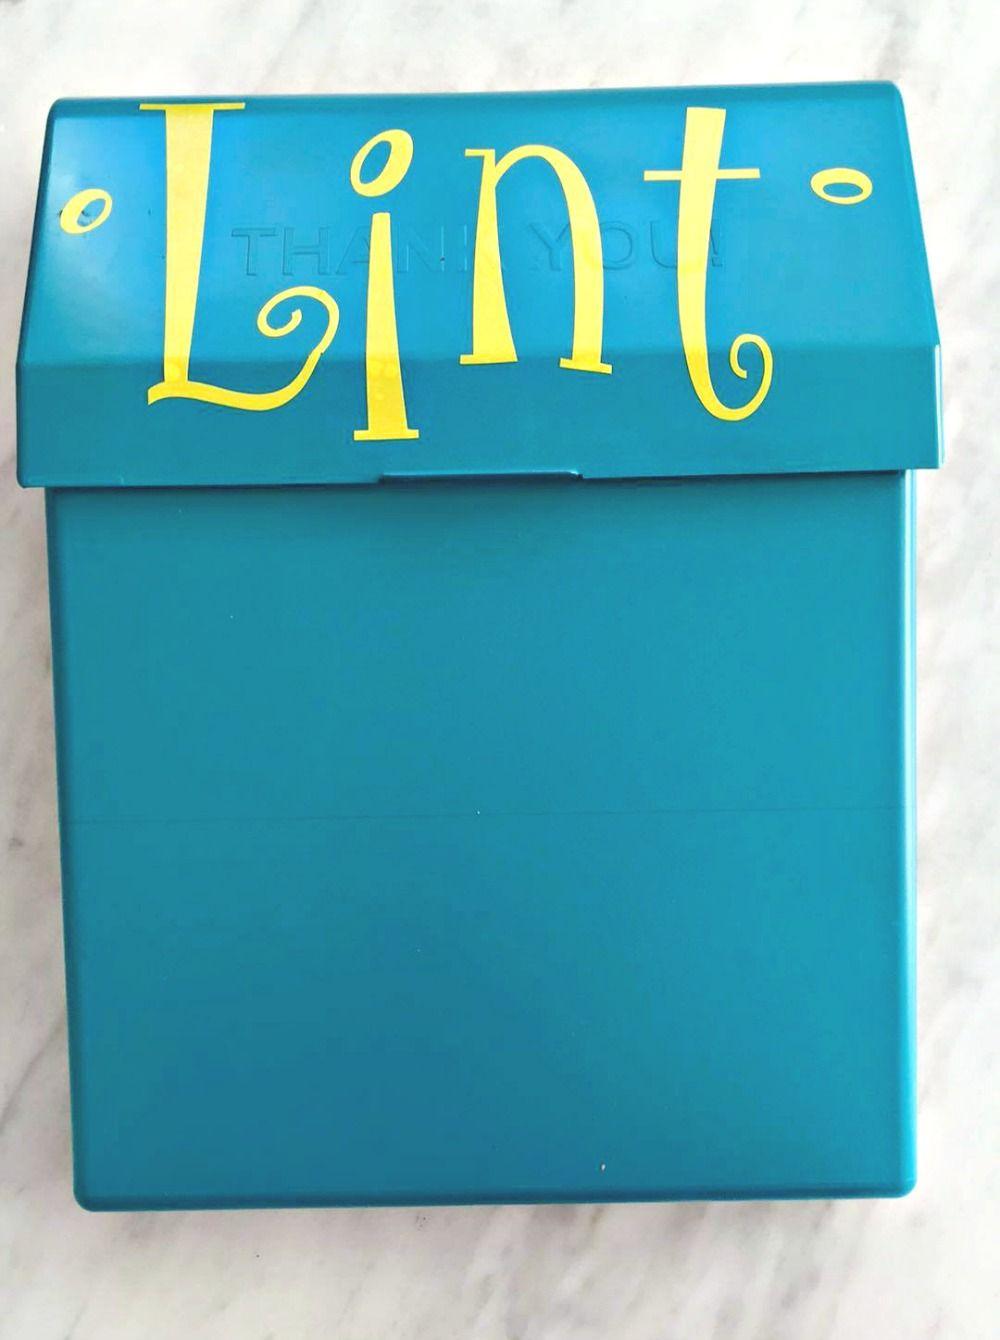 Diy Lint Trash Can Diy Laundry Diy Diy Arts And Crafts